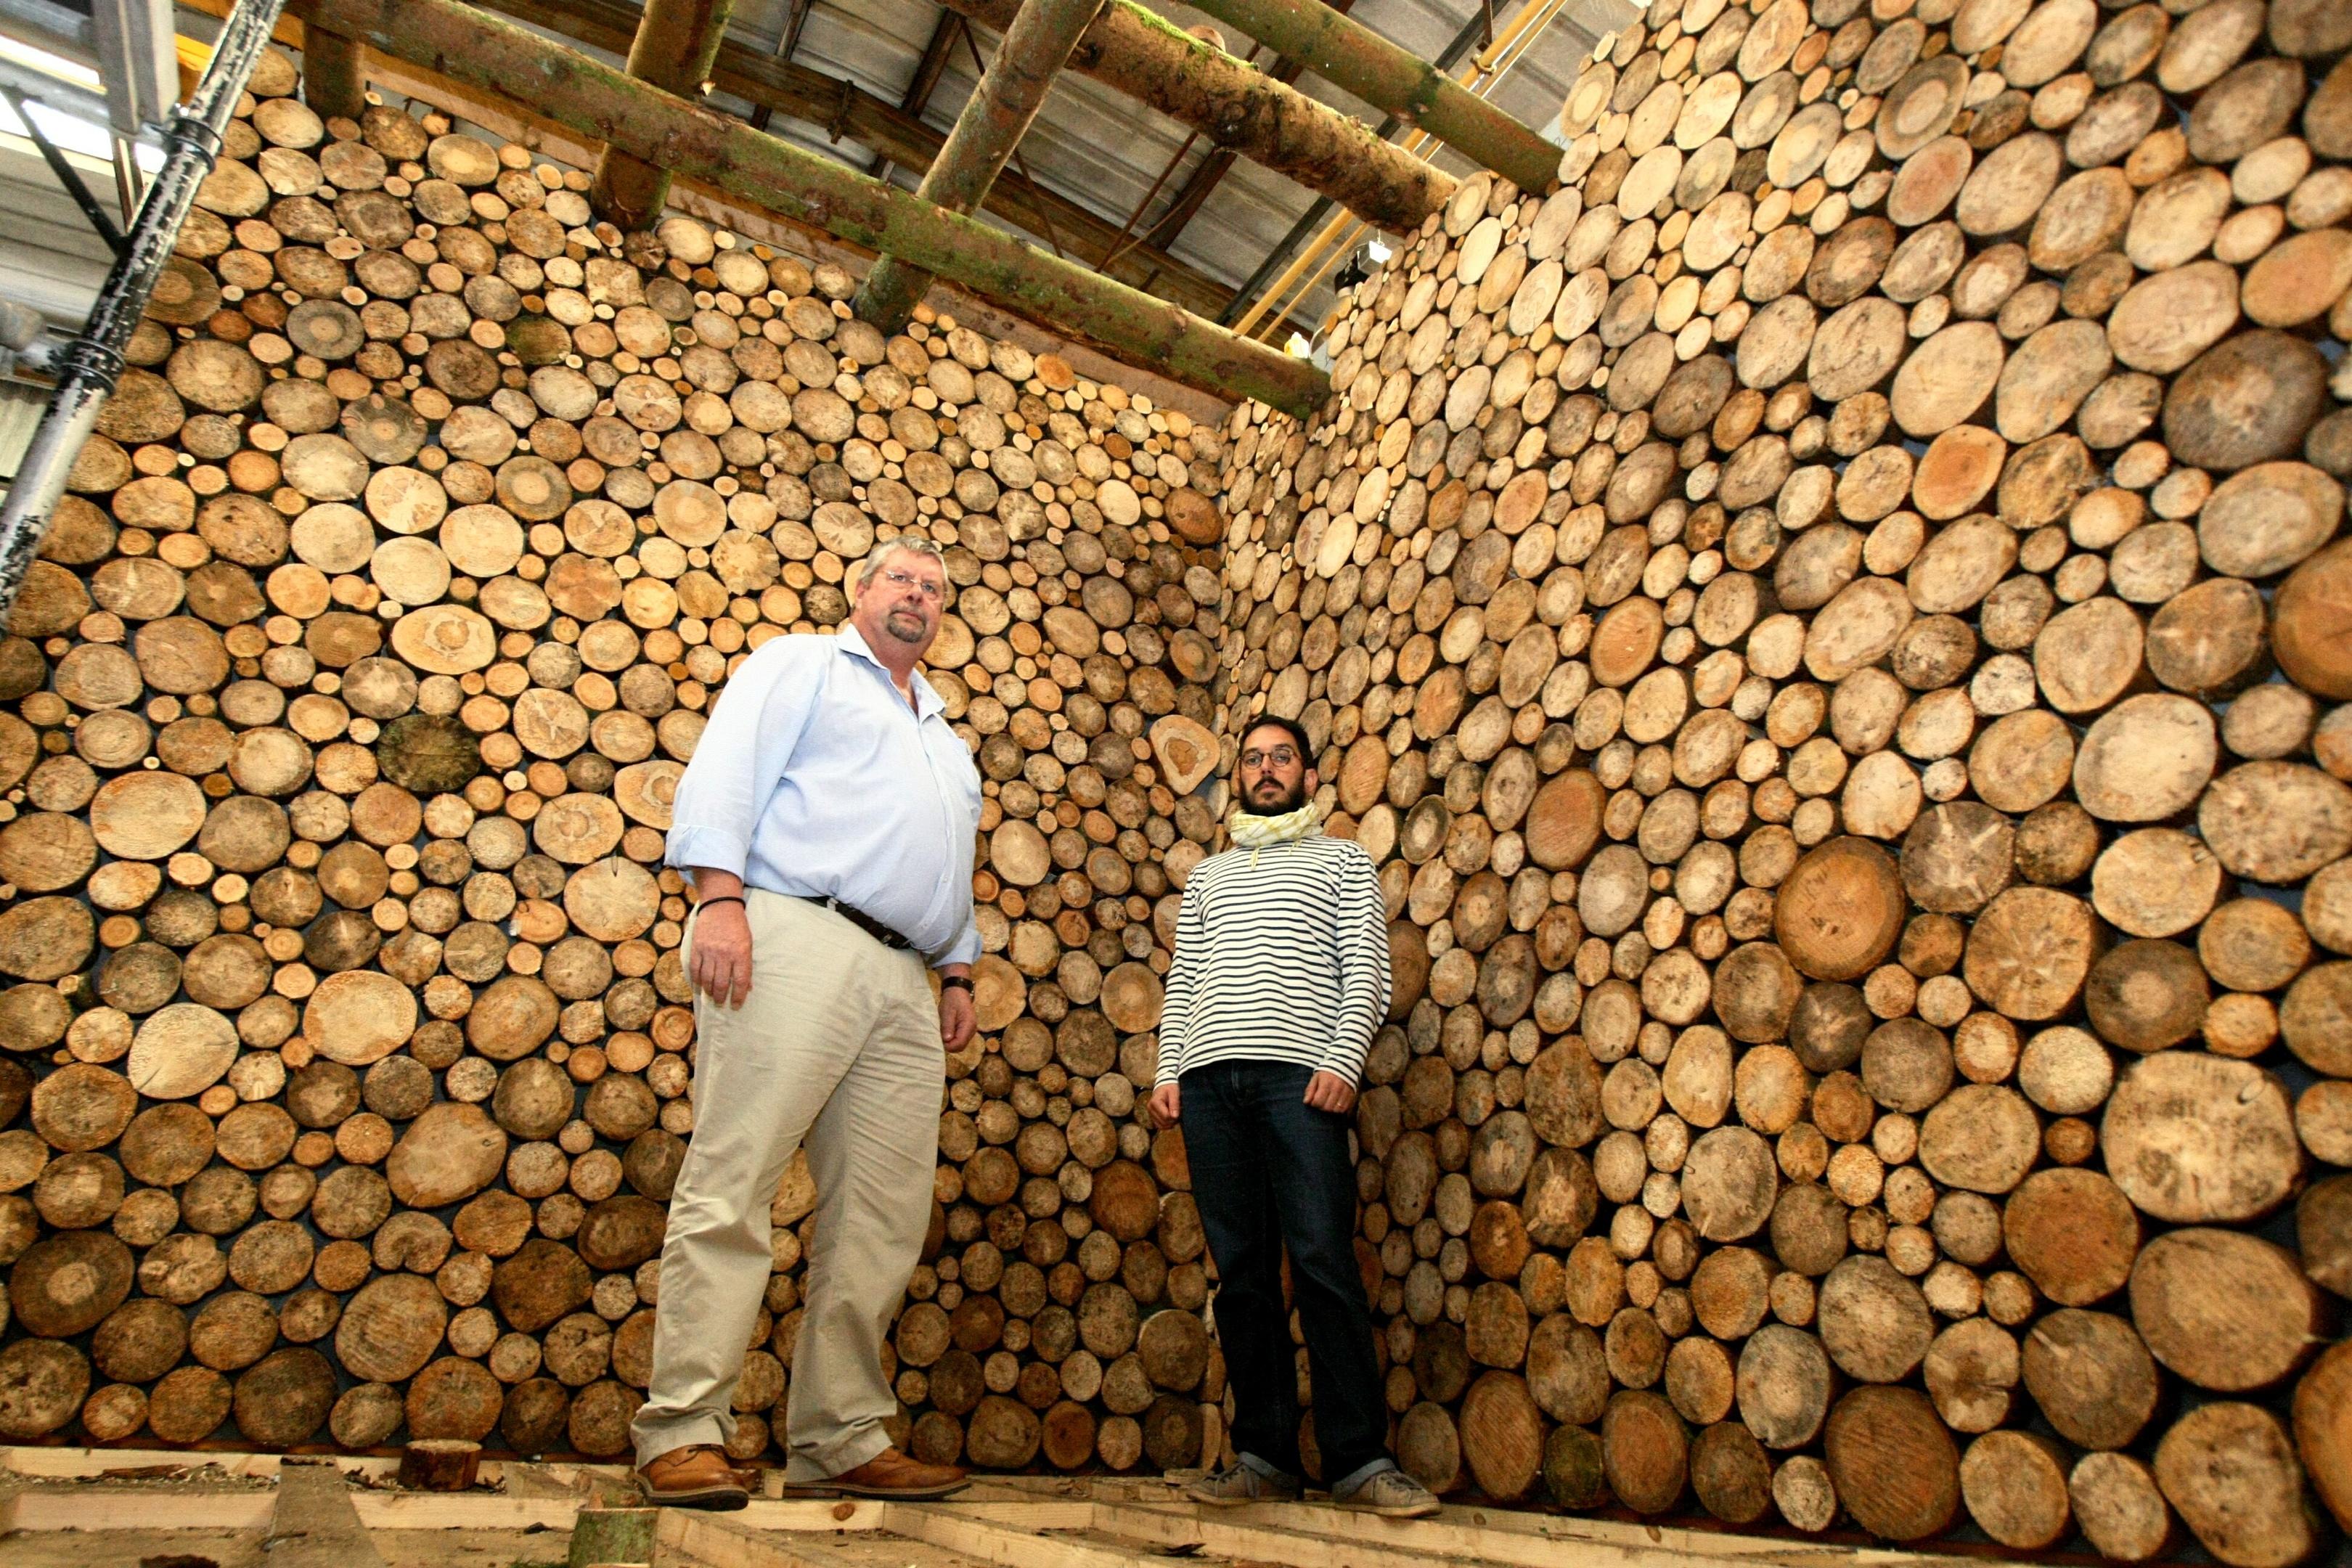 From left: Architect Doug Reid and Maurizio Mucciola of Kengo Kuma Associates.